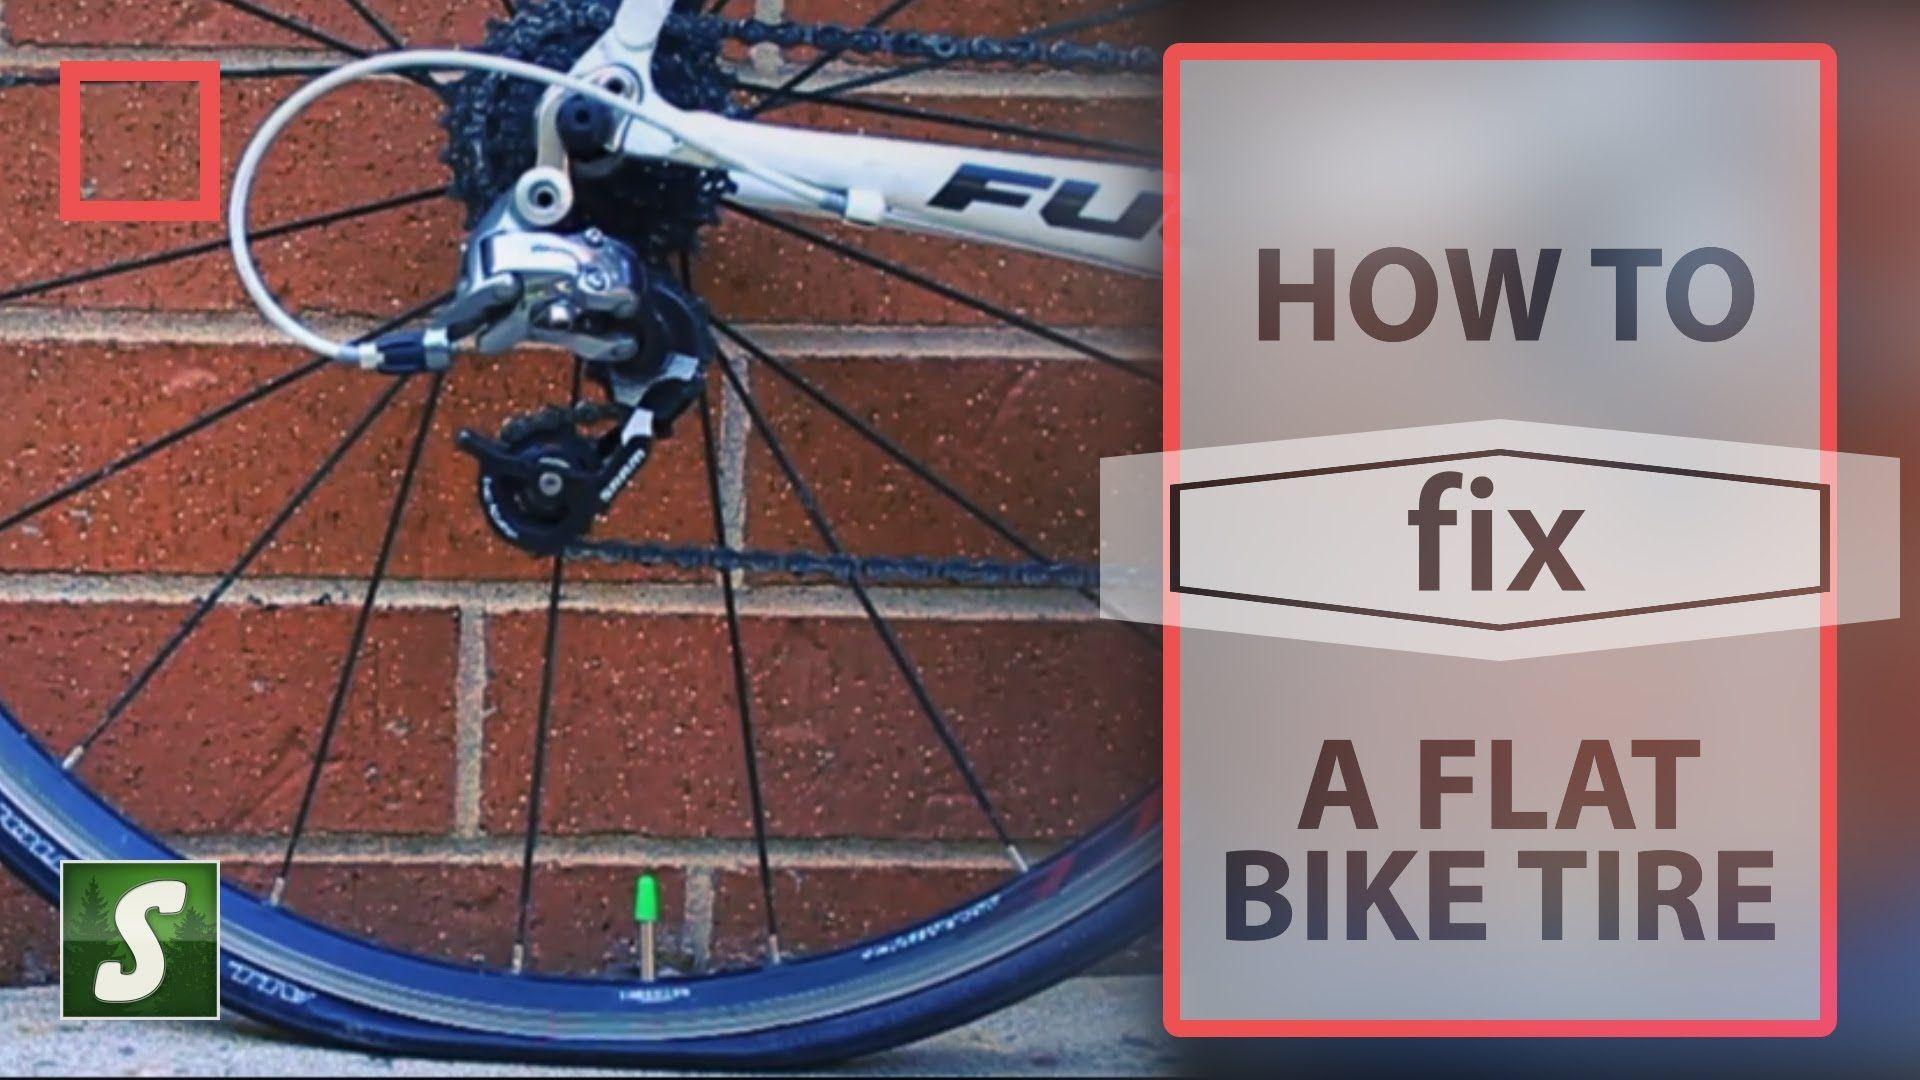 Fix a flat bike tire bike tire bike tire